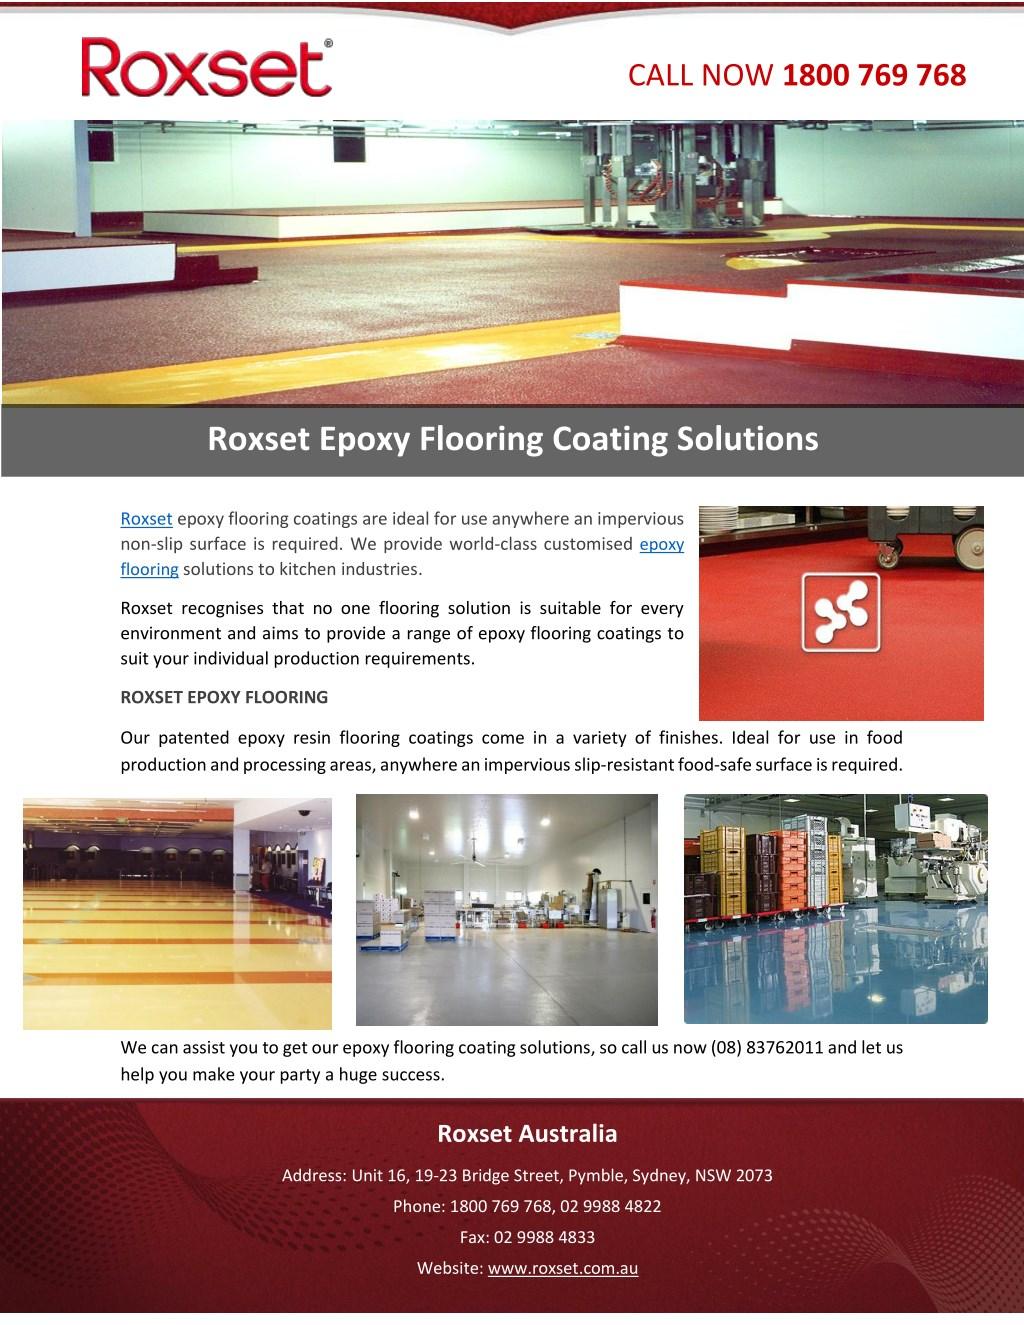 PPT - Roxset Epoxy Flooring Coating Solutions PowerPoint